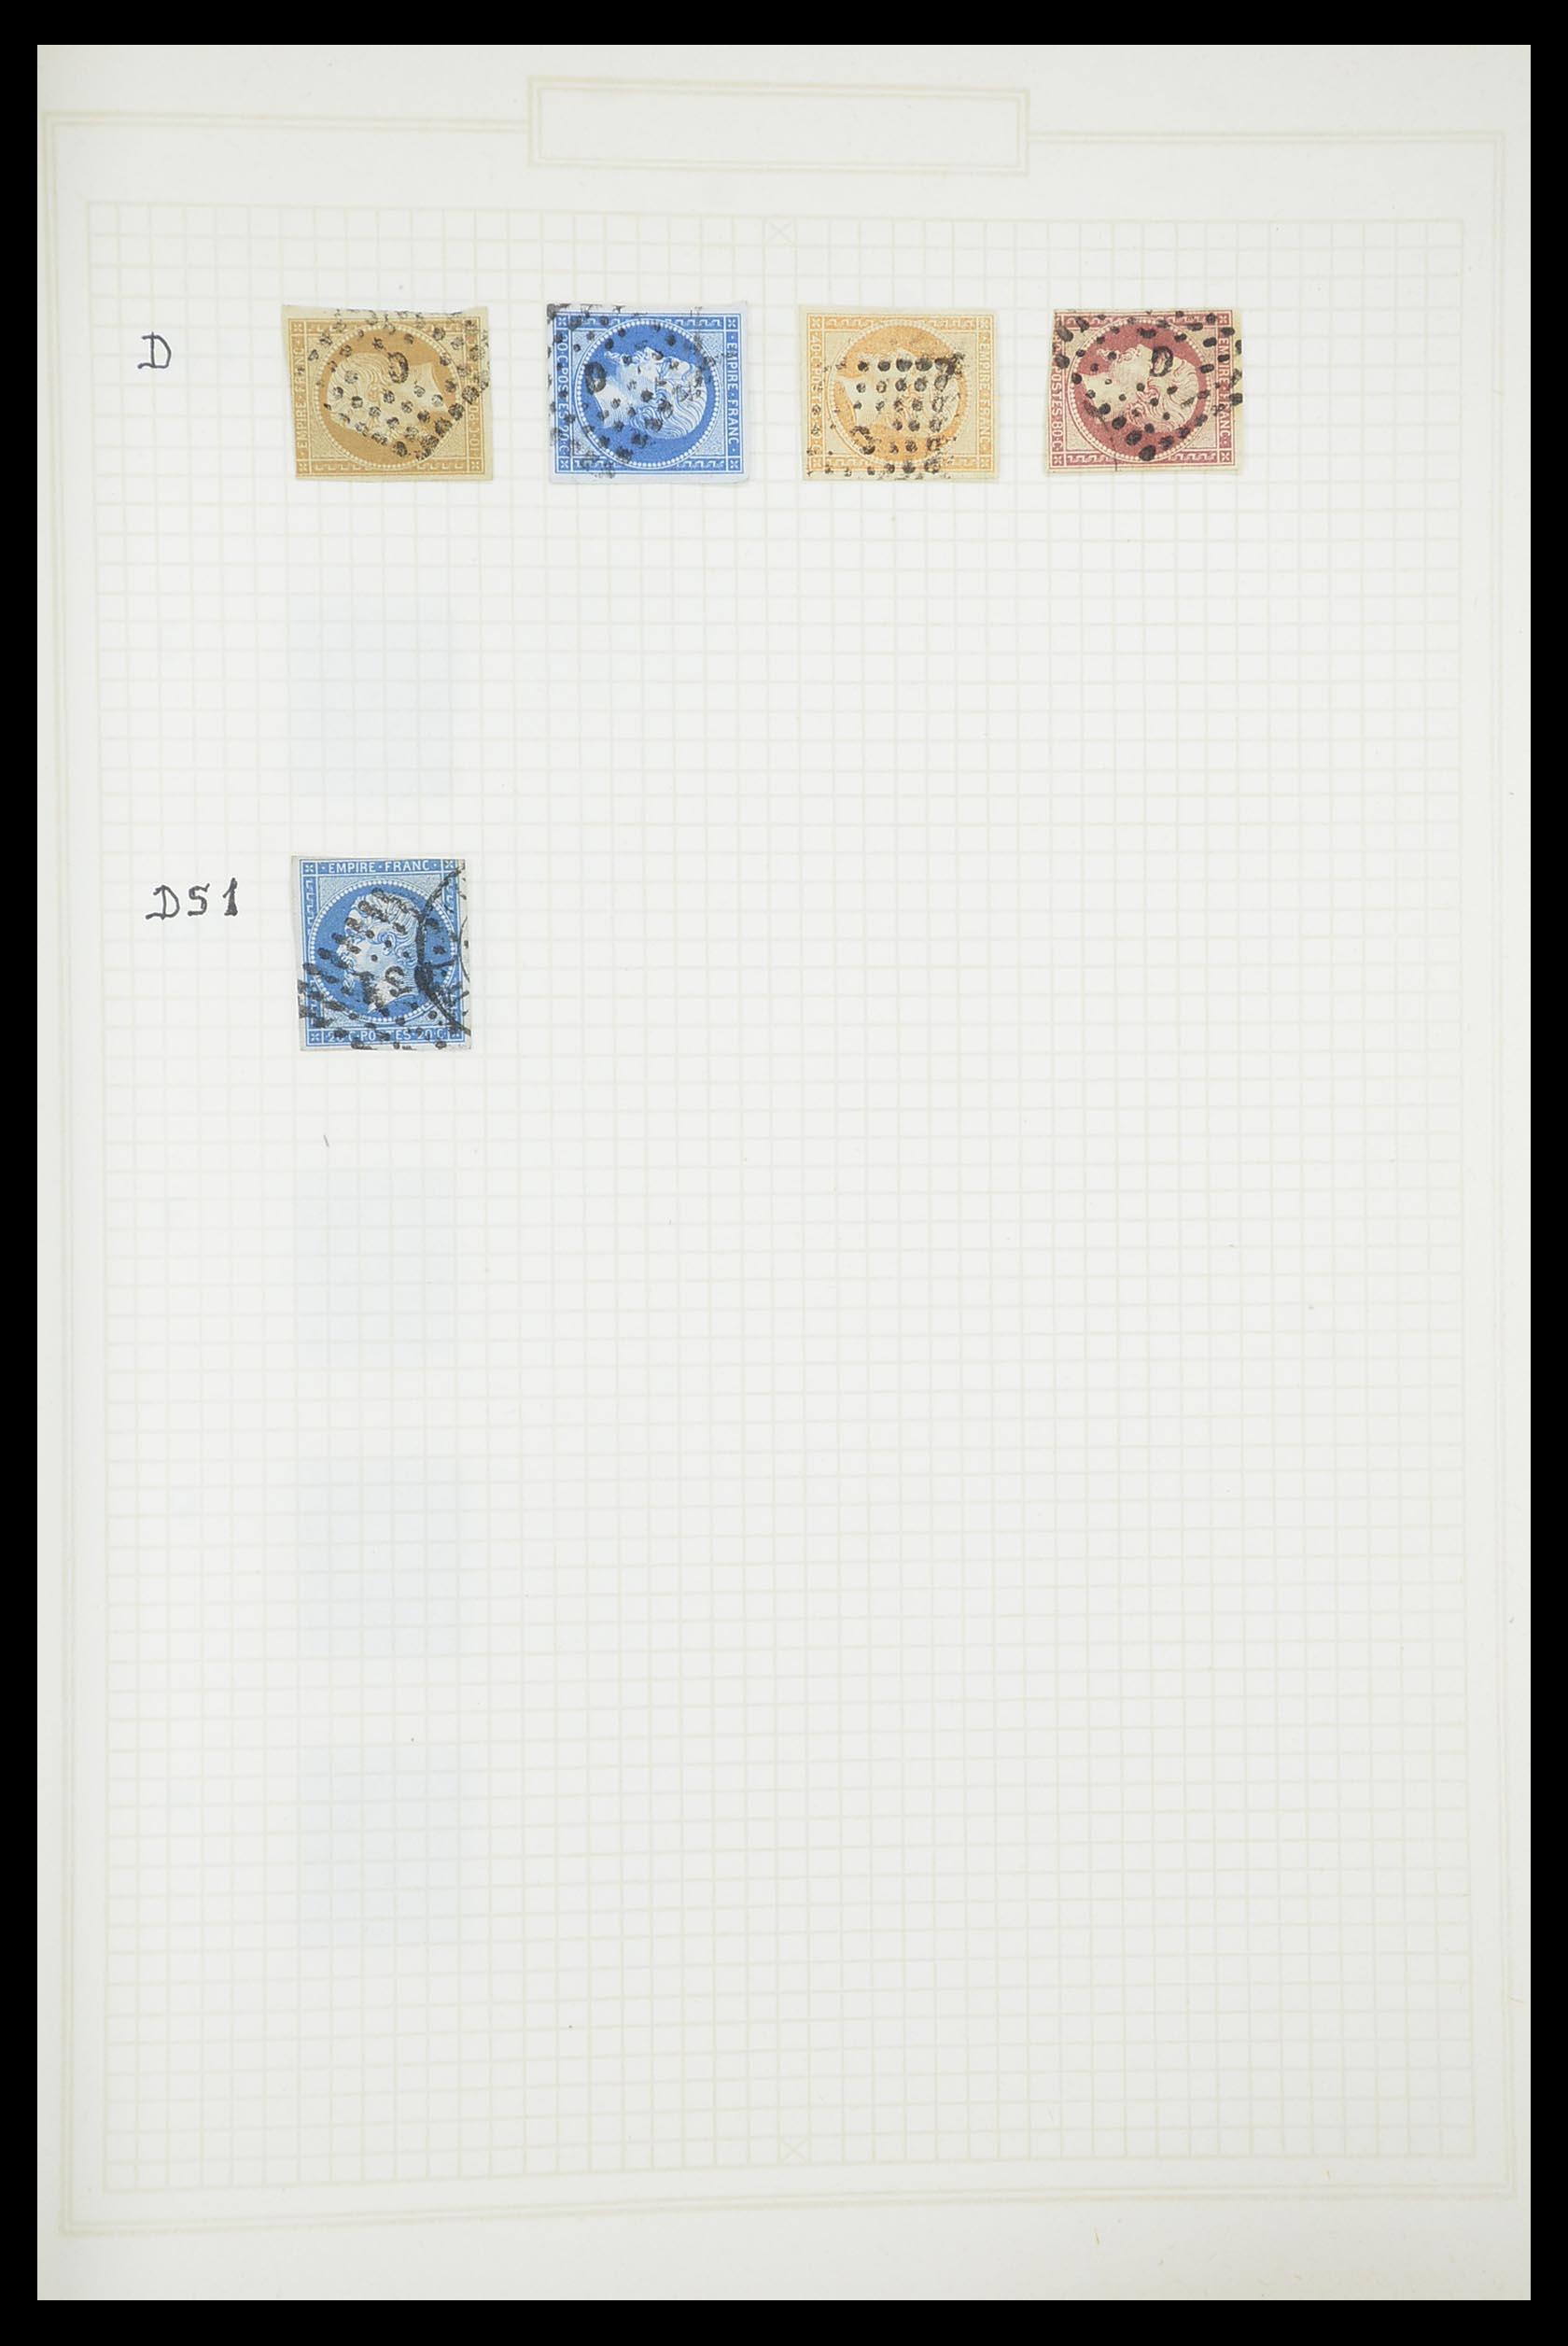 33851 018 - Postzegelverzameling 33851 Frankrijk klassiek stempels.